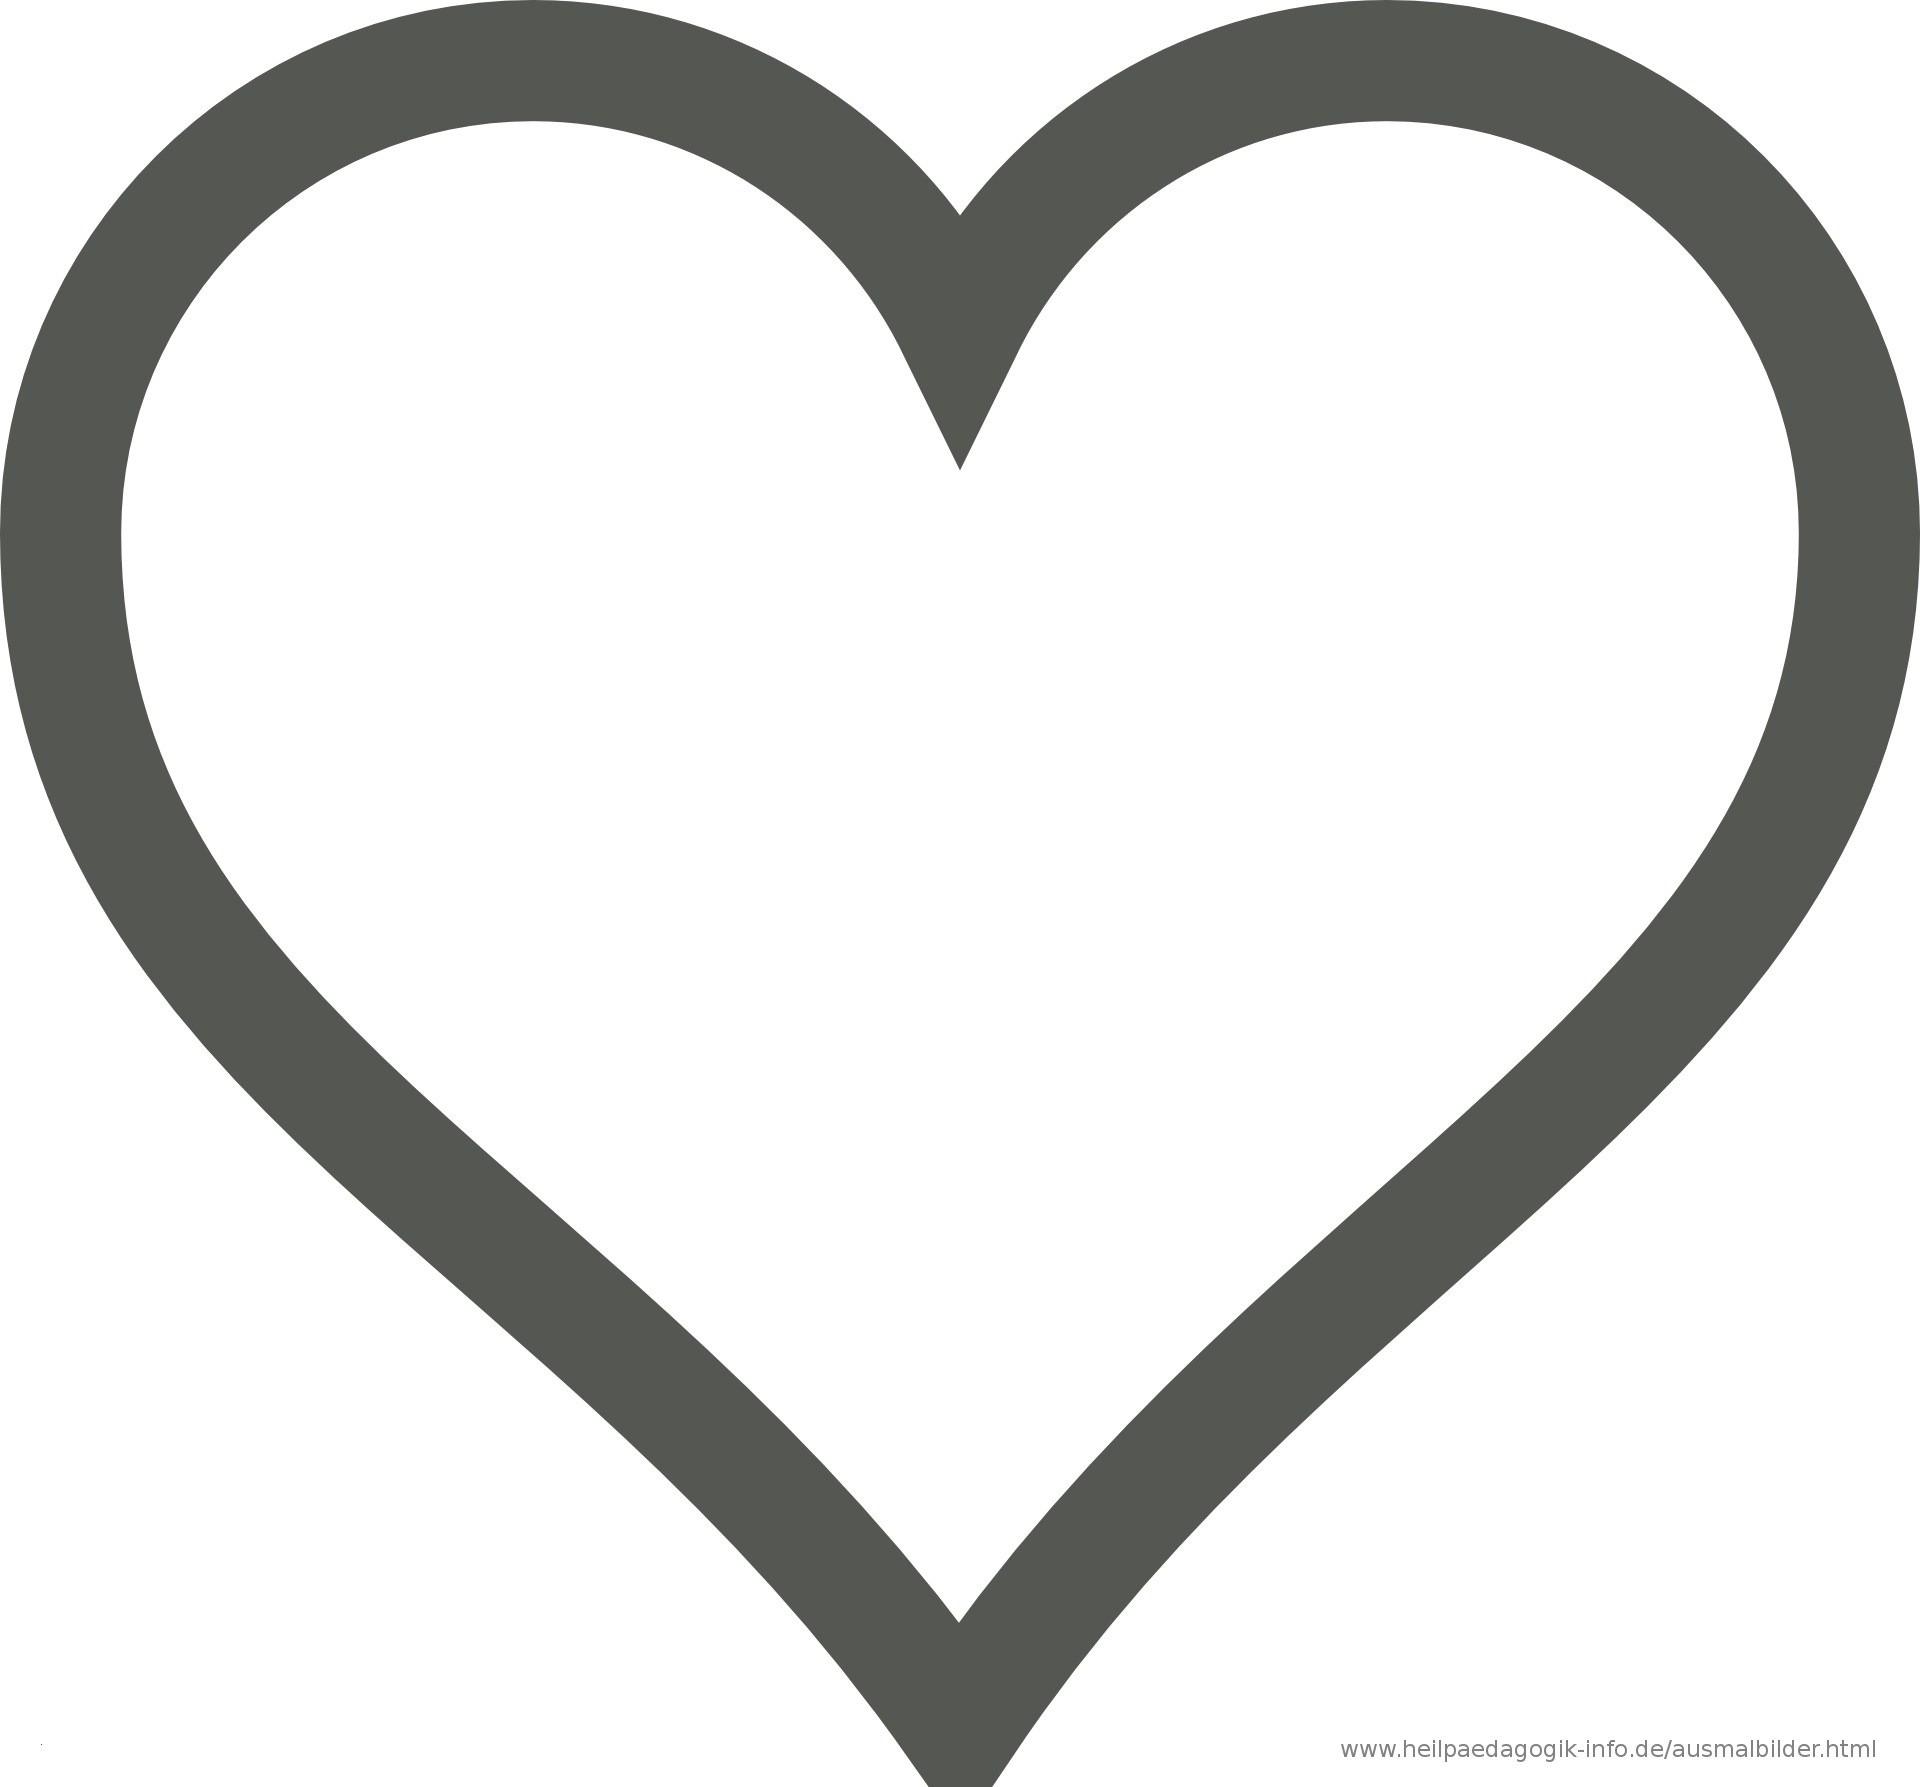 Mandalas Zum Ausdrucken Herzen Frisch Herz Malvorlagen Einfach Herz Mandalas Zum Ausdrucken – Malvorlagen Stock